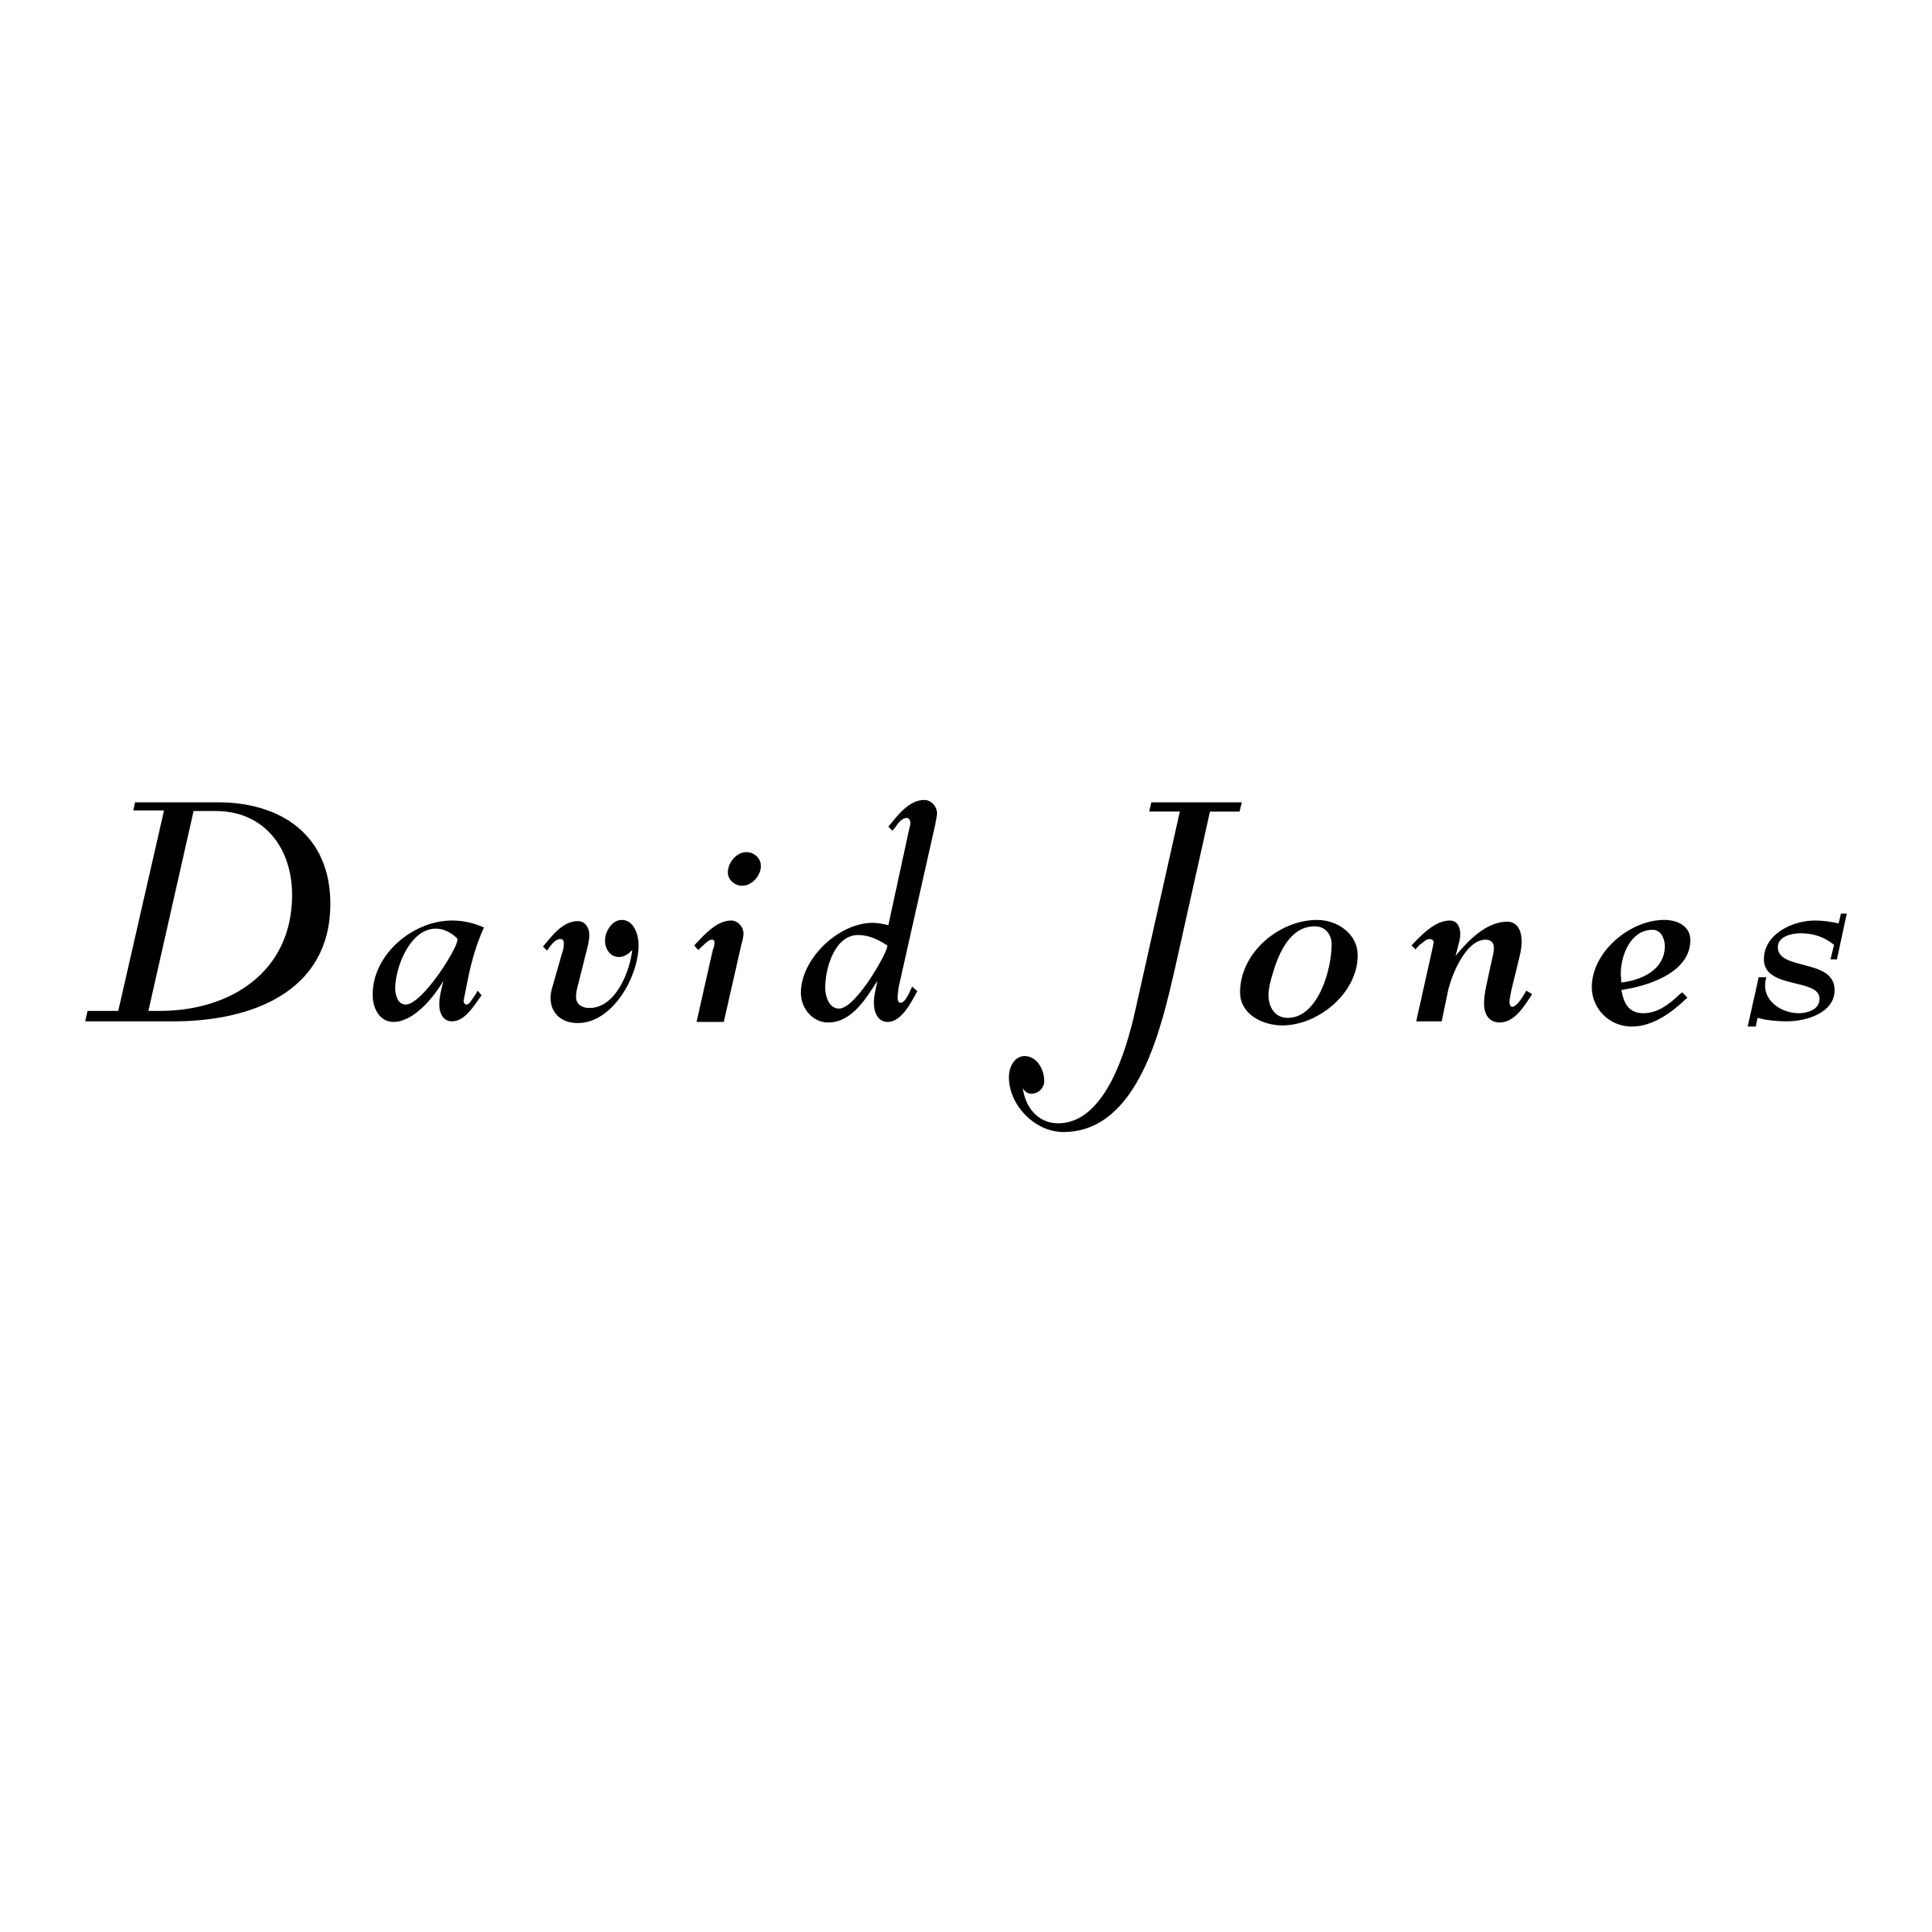 David Jones Logo PNG Transparent & SVG Vector.